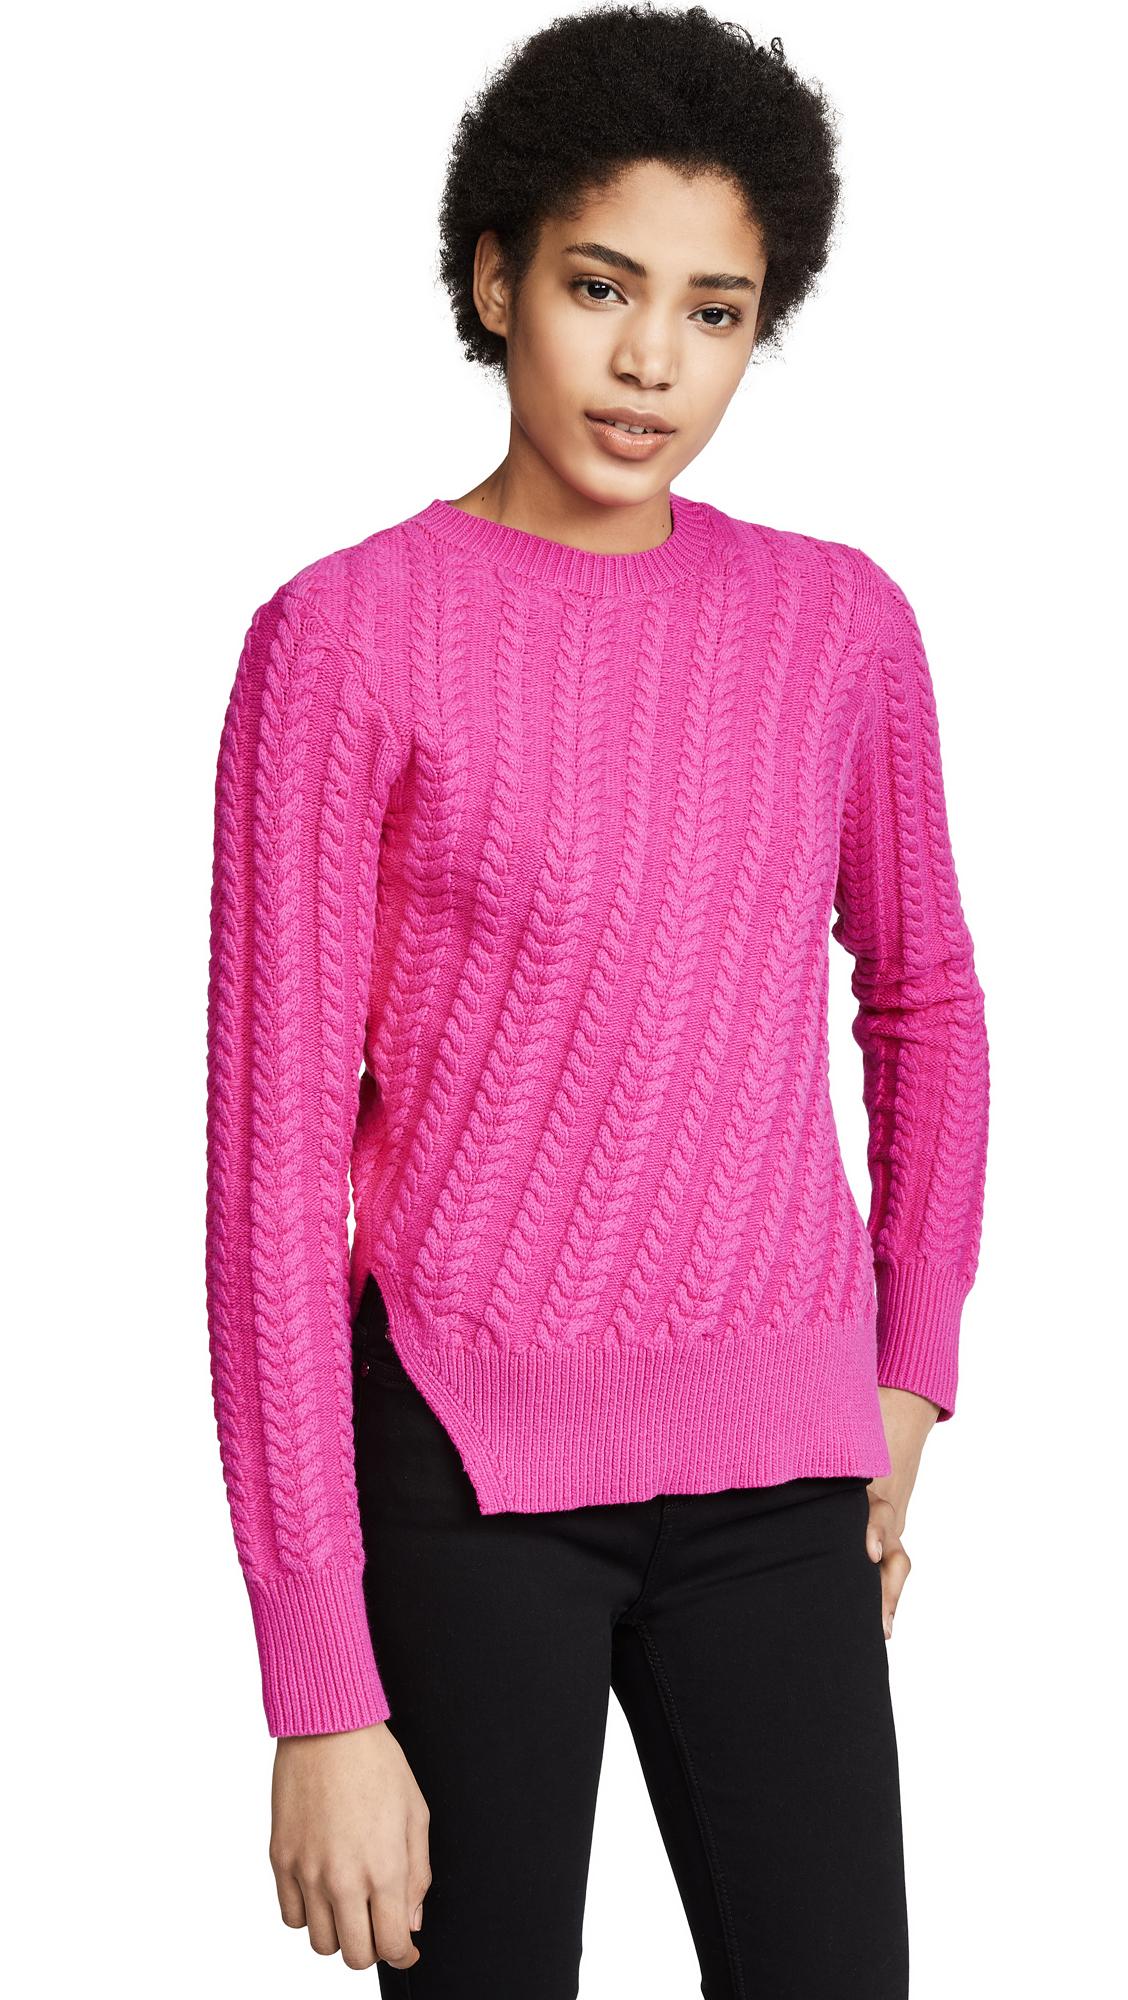 Derek Lam 10 Crosby Crew Neck Sweater - Hot Pink